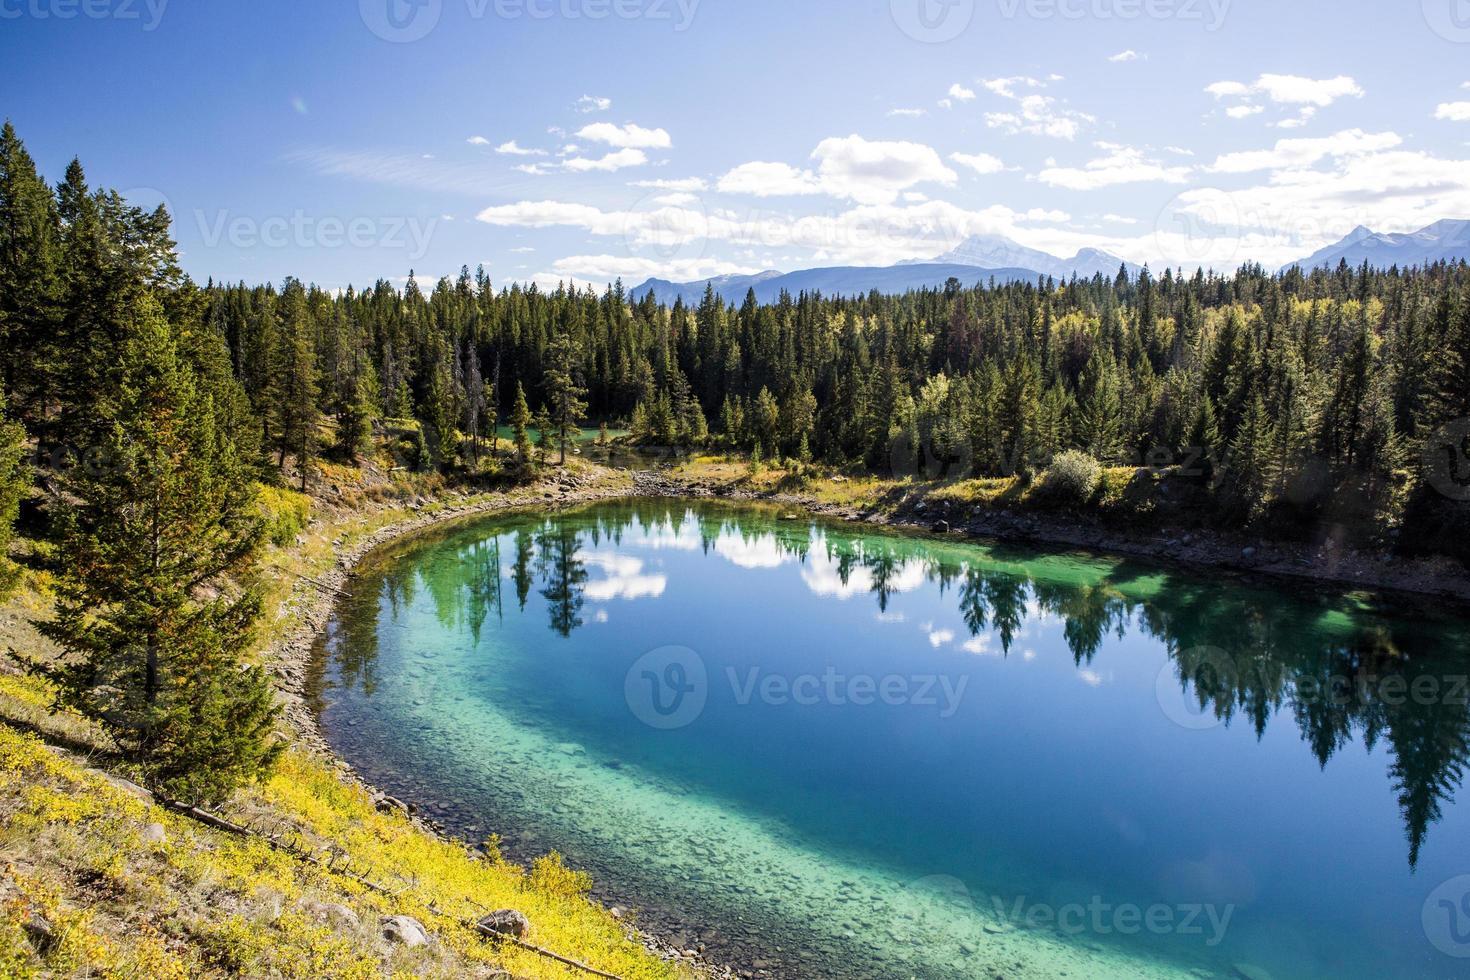 tredje sjön, dalen med de 5 sjöarna, jaspis nationalpark foto